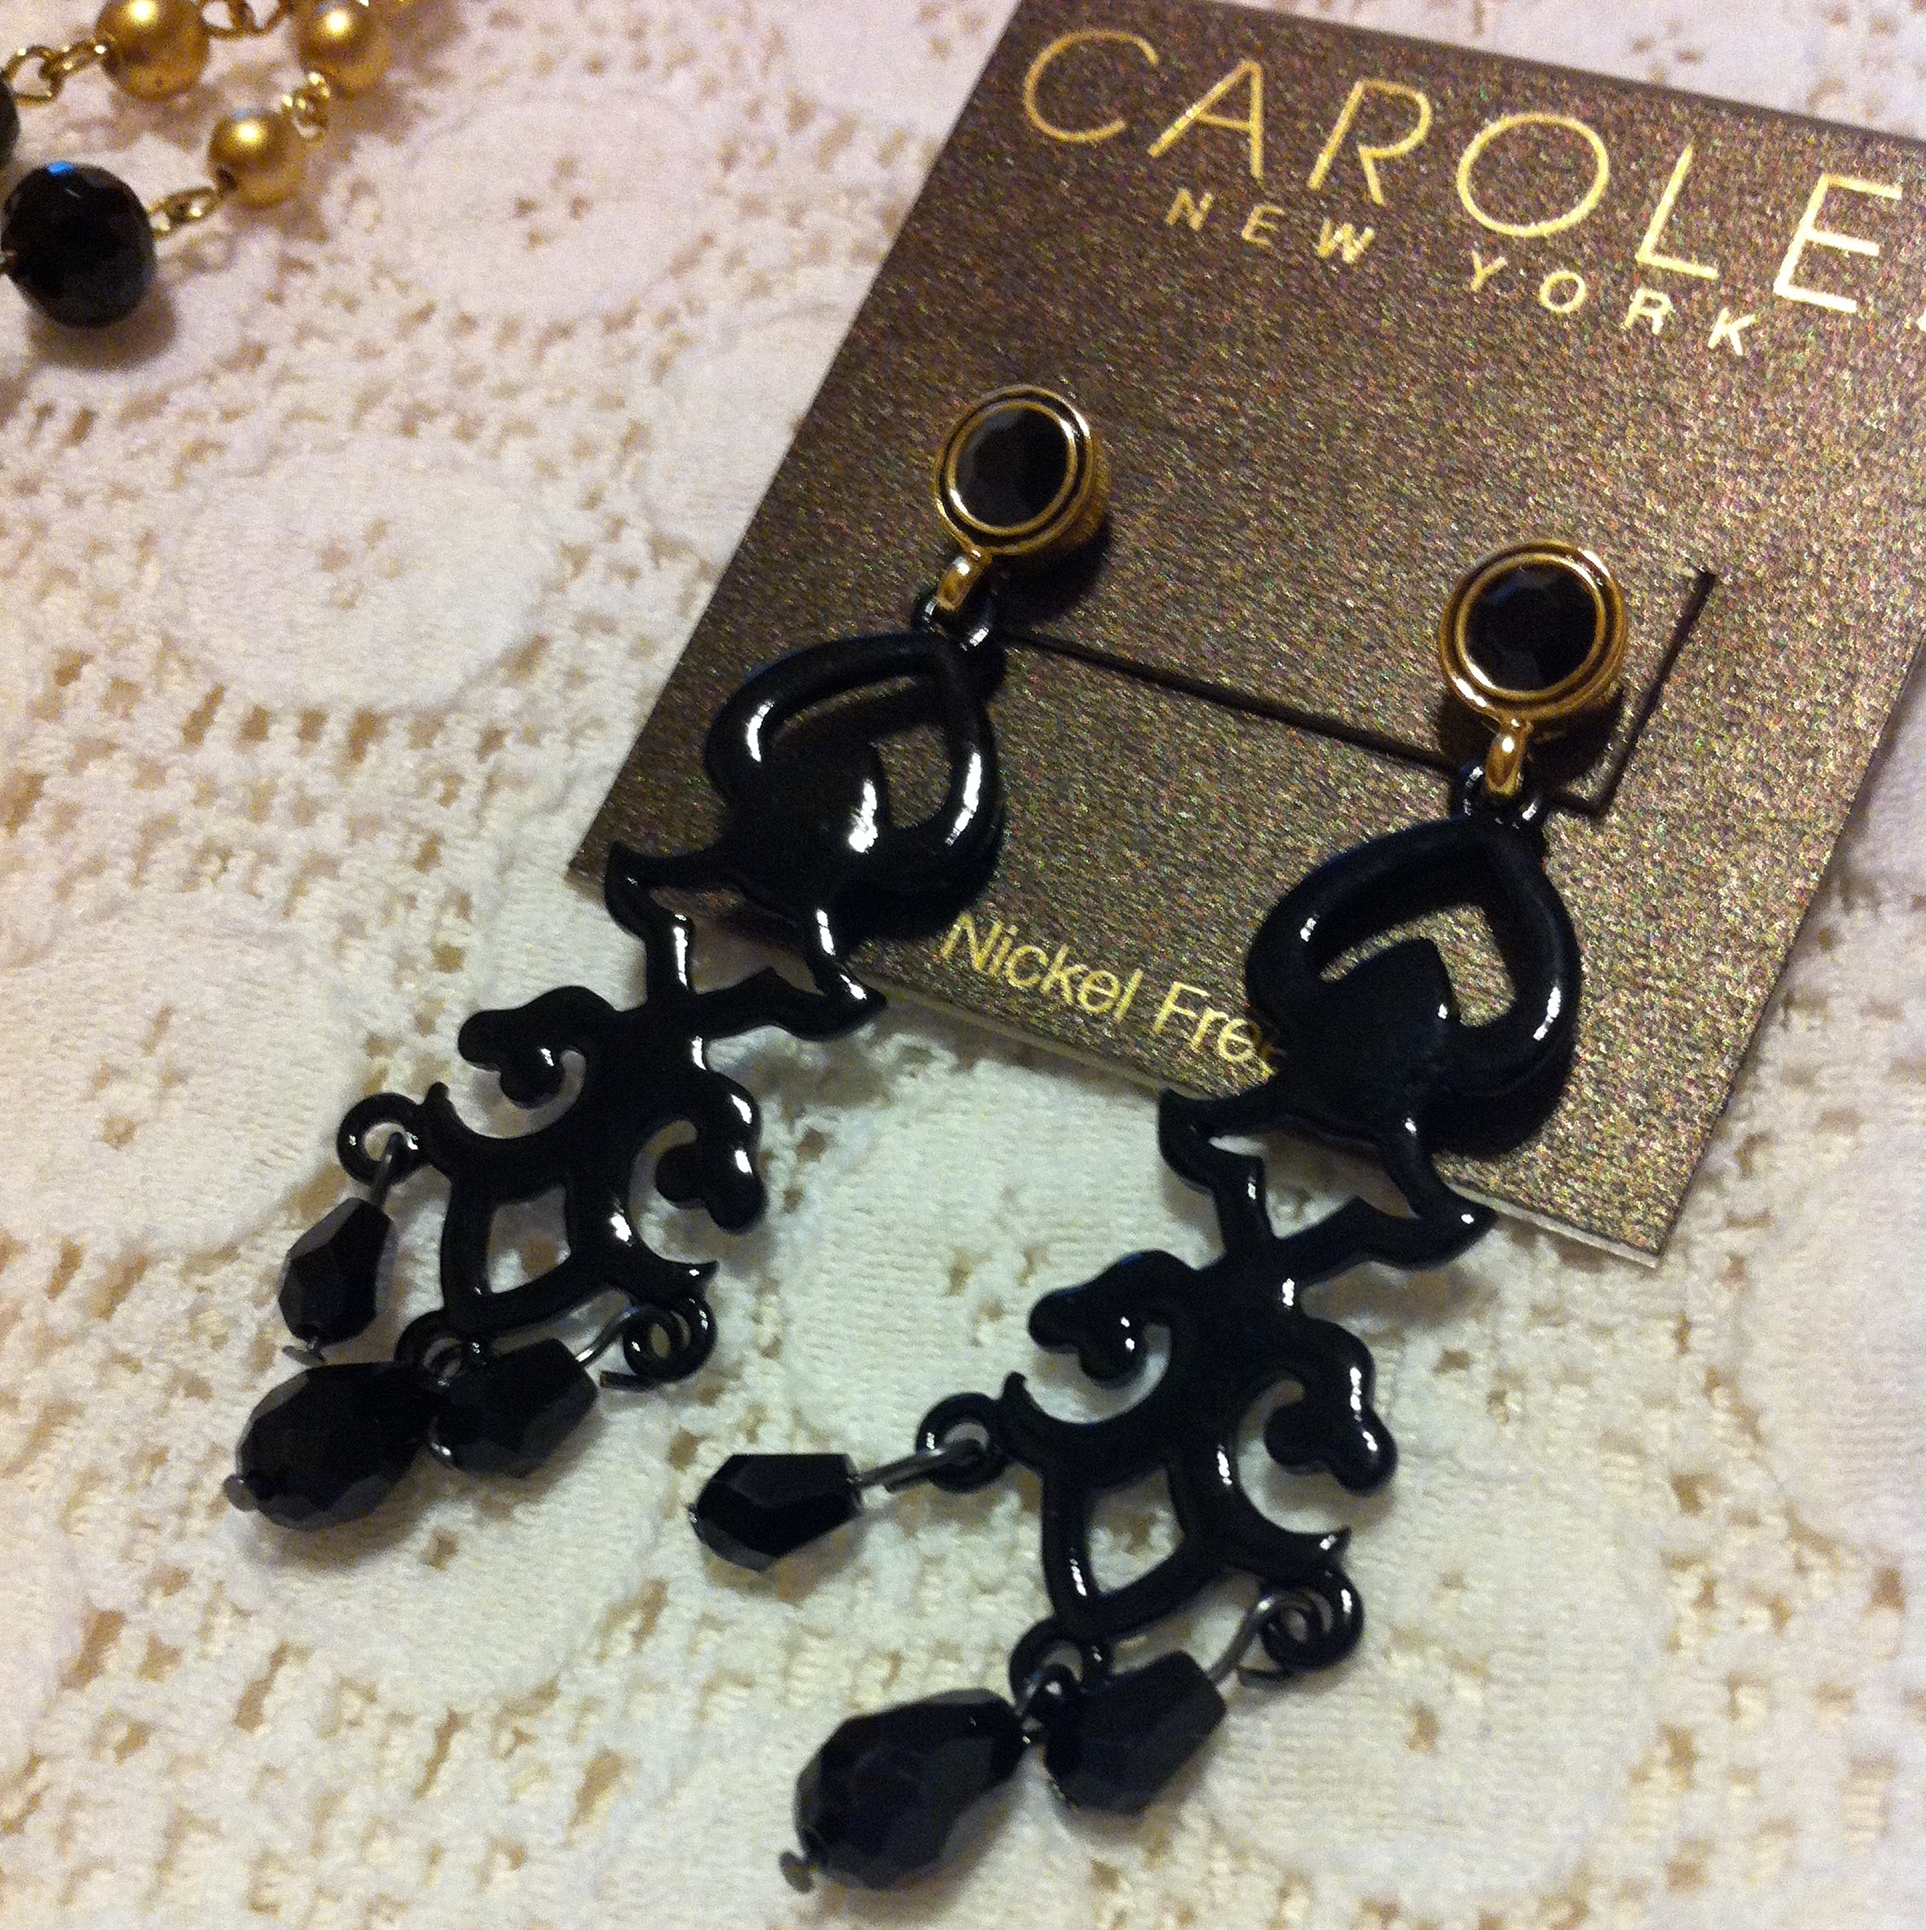 Giveaway: Black Chandelier Earrings from Carolee (US, Ends 5/25 ...